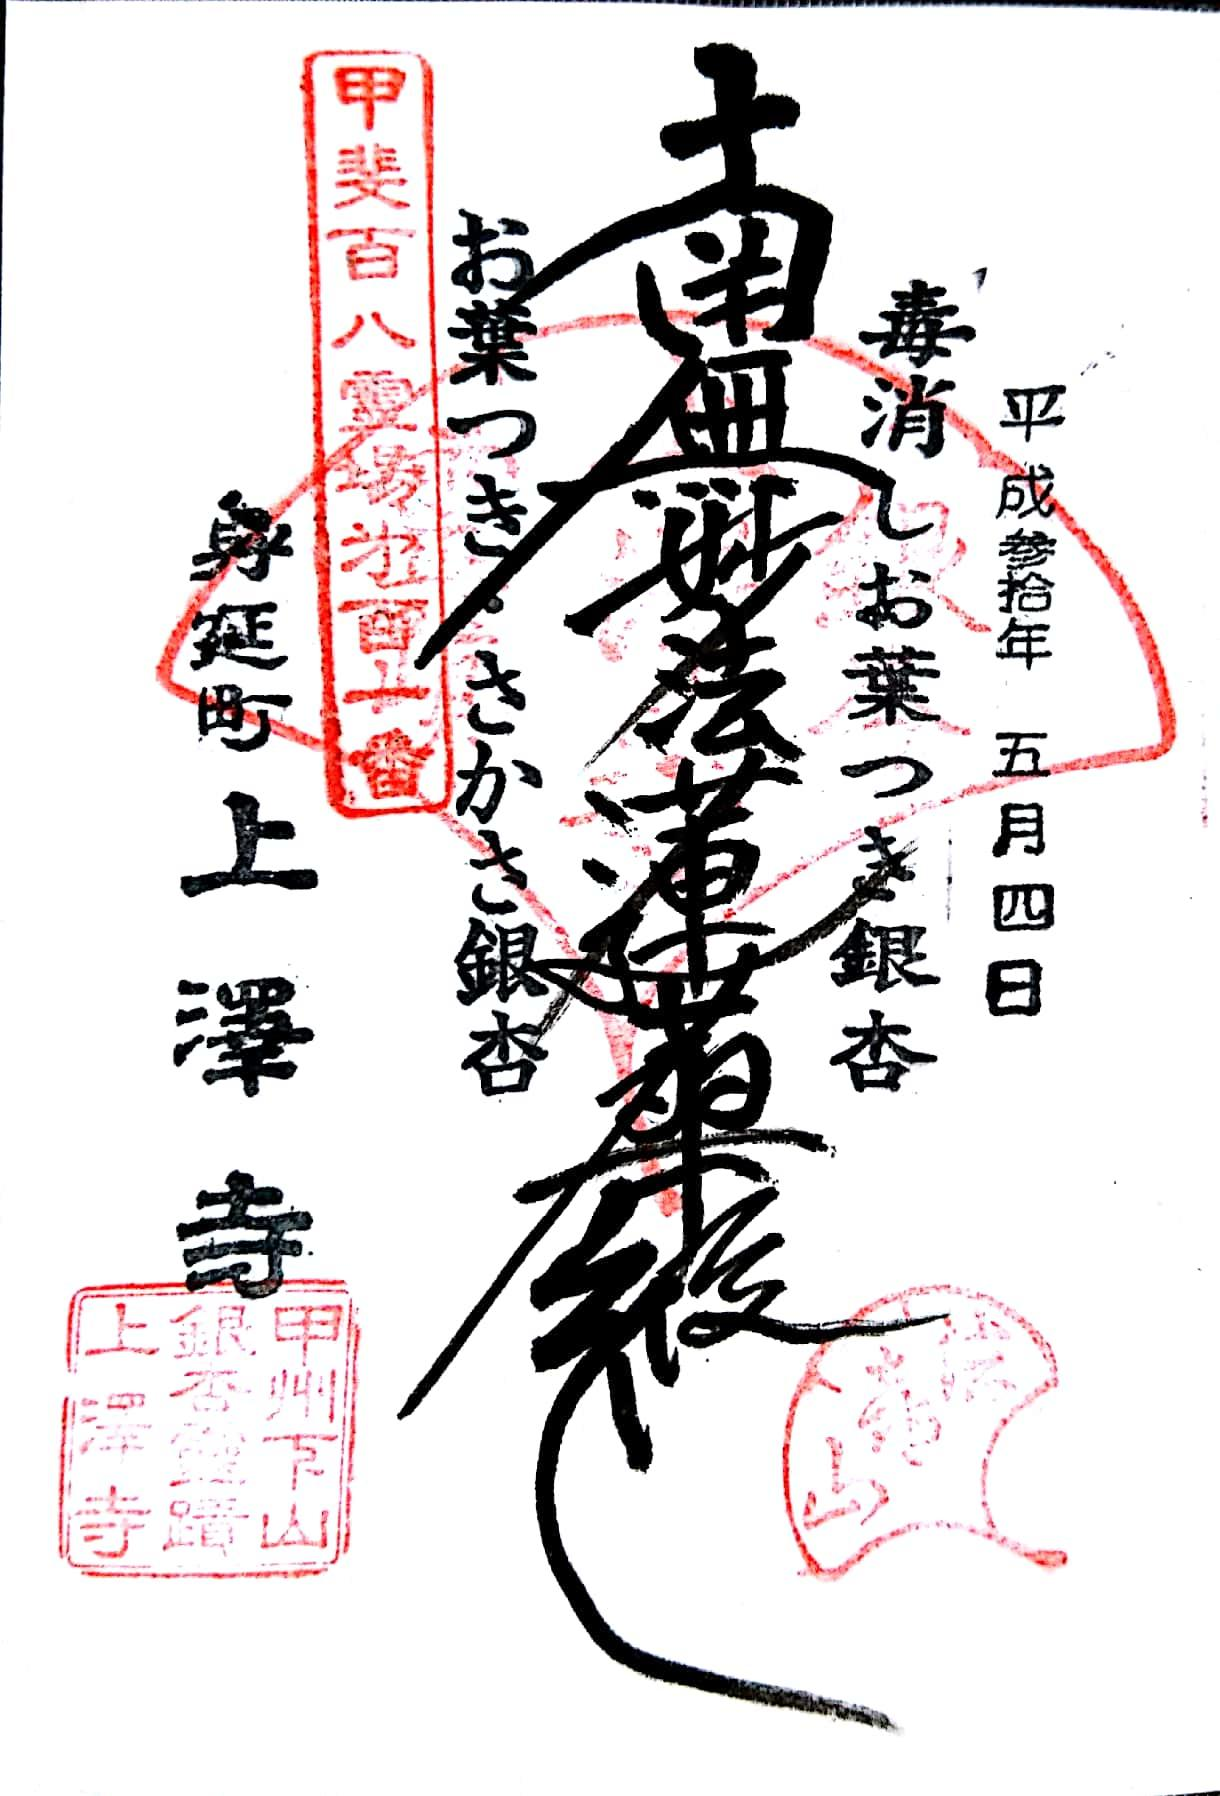 上澤寺の御朱印